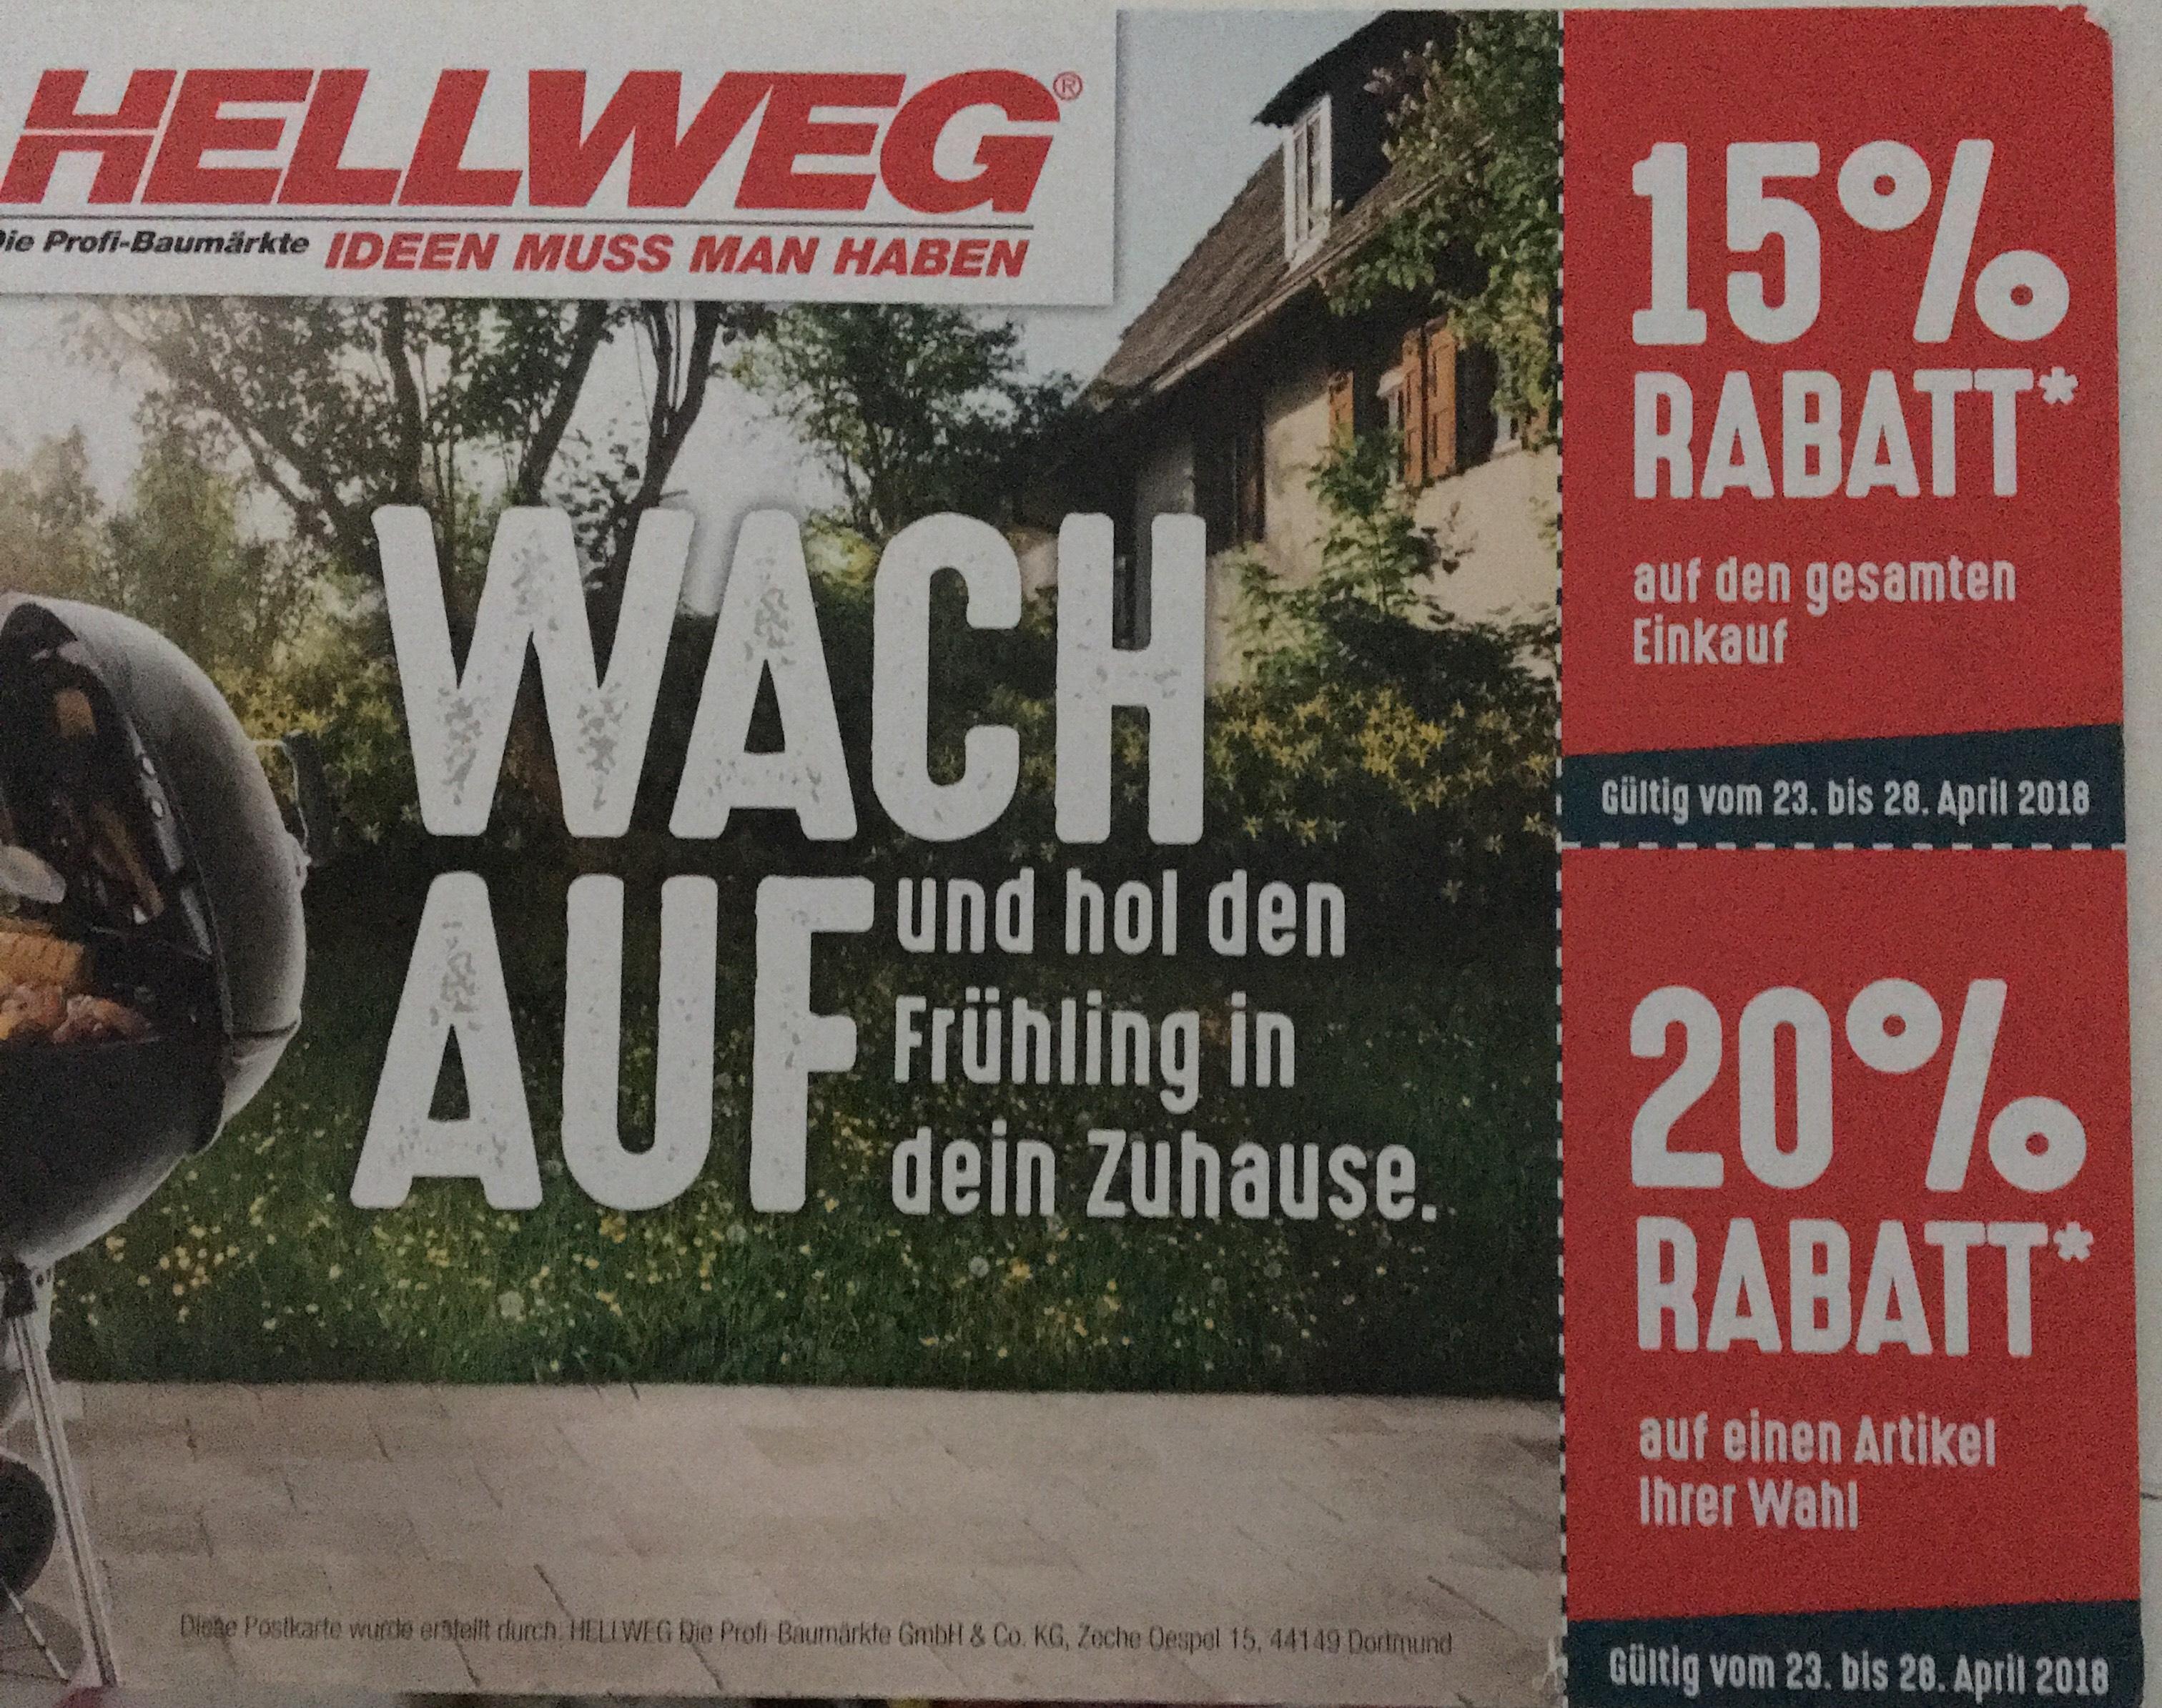 Hellweg 20% Coupon